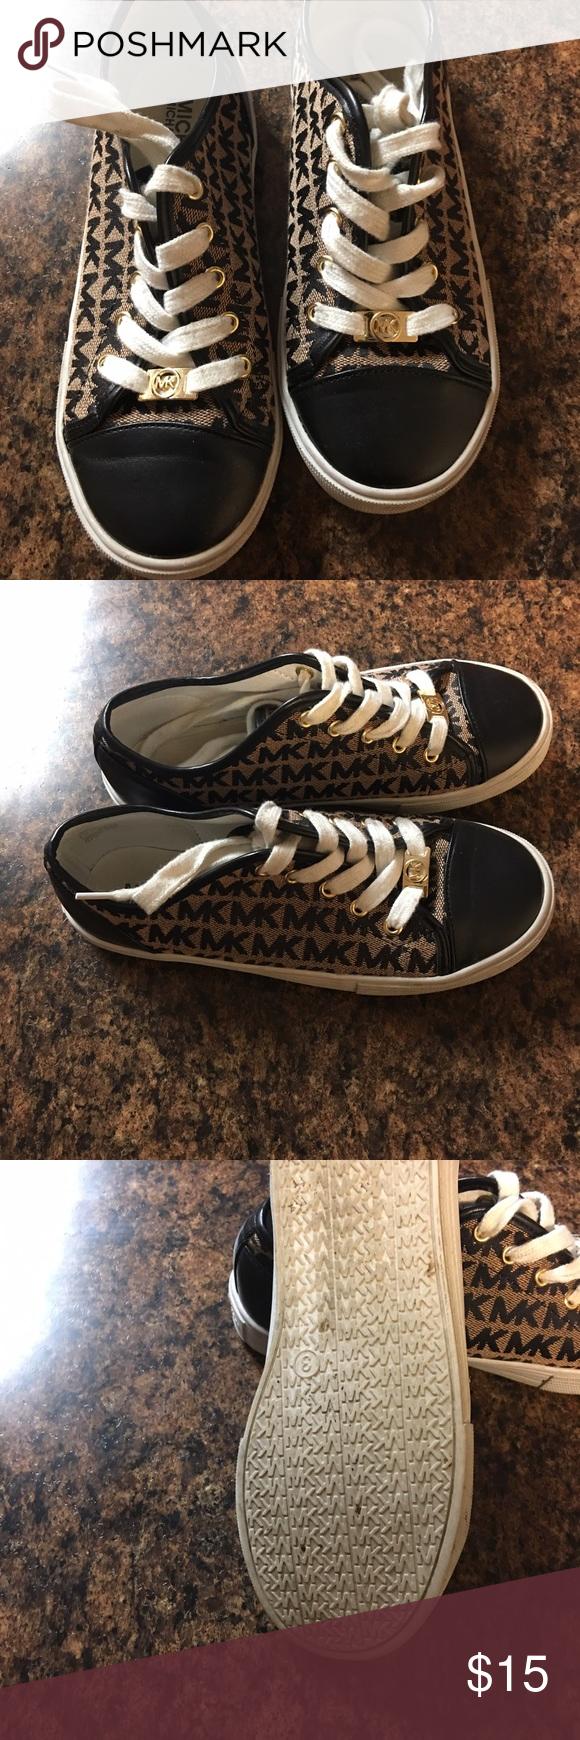 Girls Michael kors Michael kors girls tennis shoes Michael Kors Shoes Sneakers